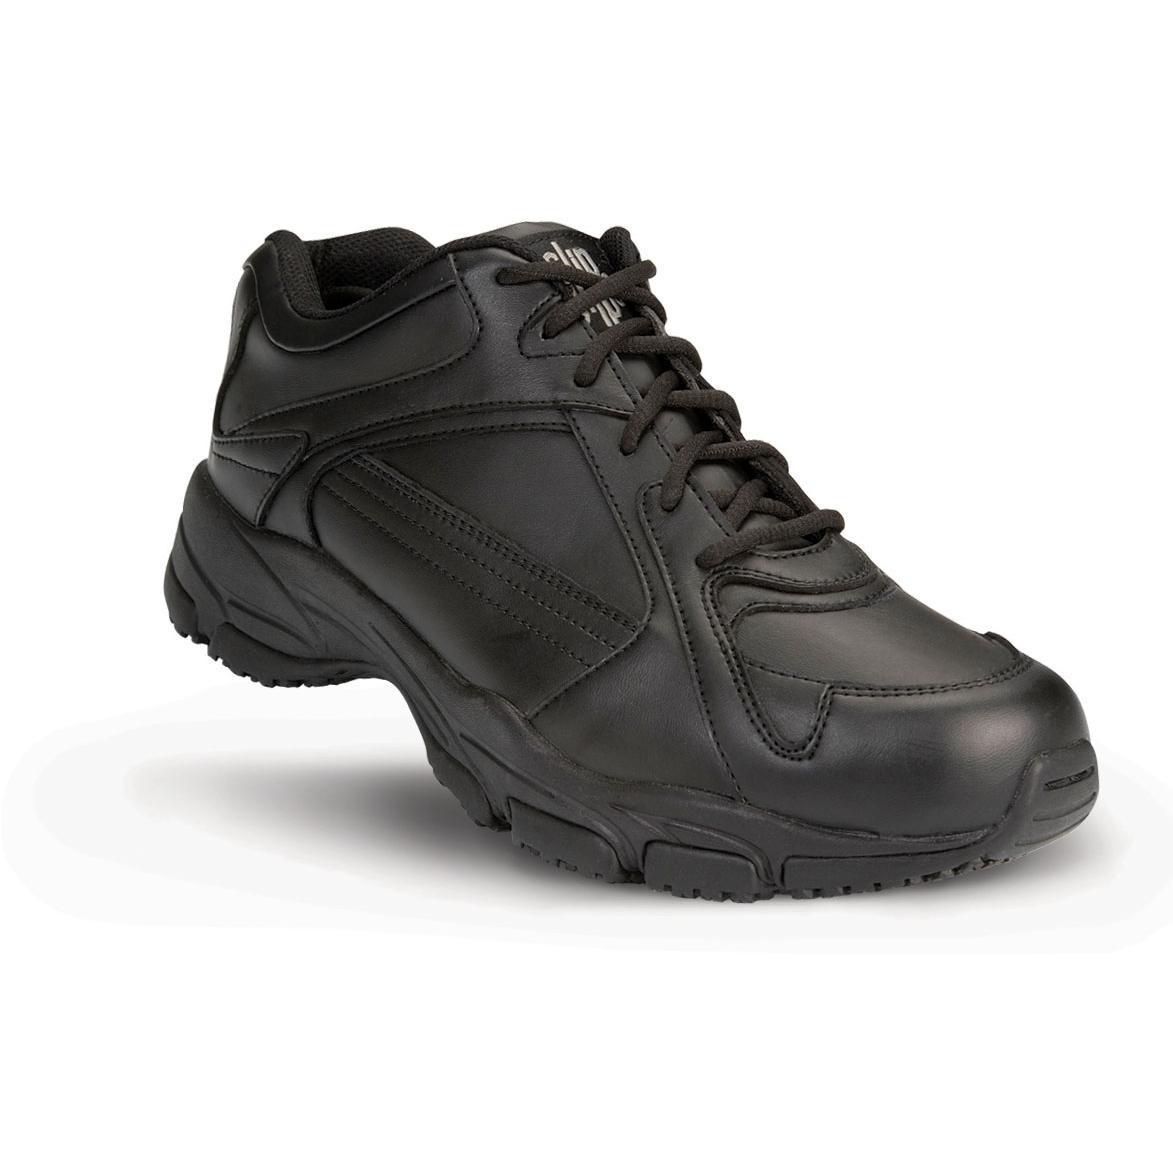 slipgrips slip resistant athletic work shoes 7324r